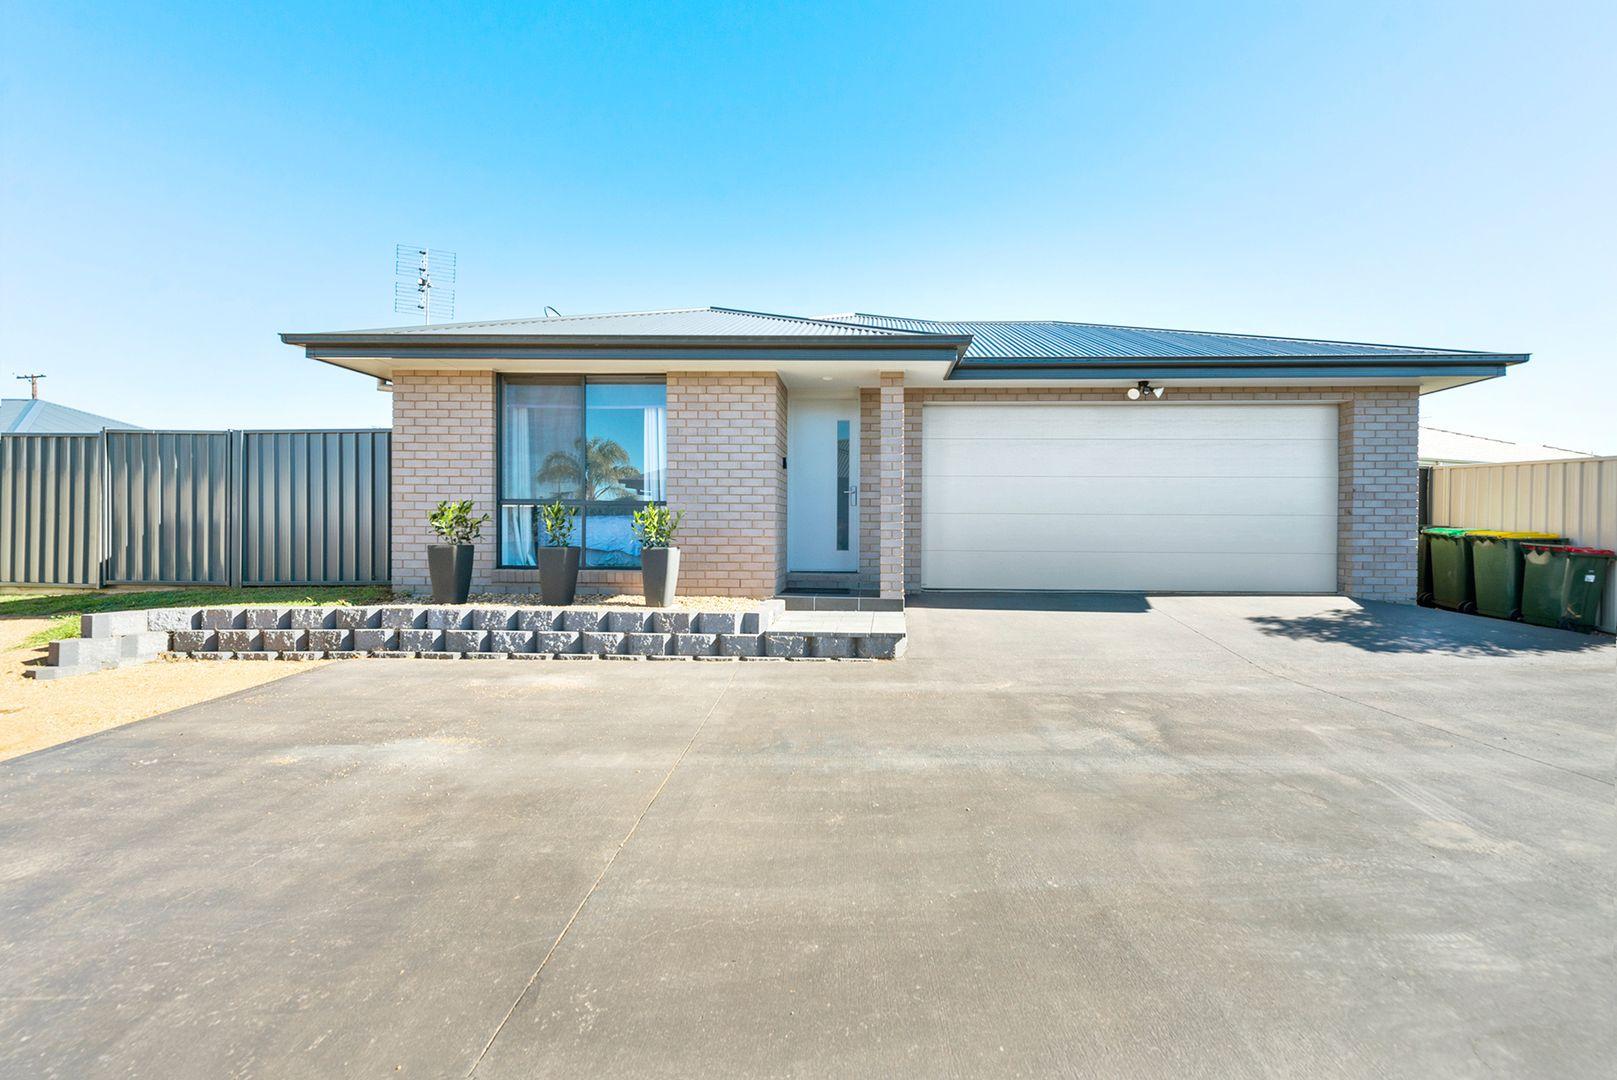 26 Spears Drive, Dubbo NSW 2830, Image 0